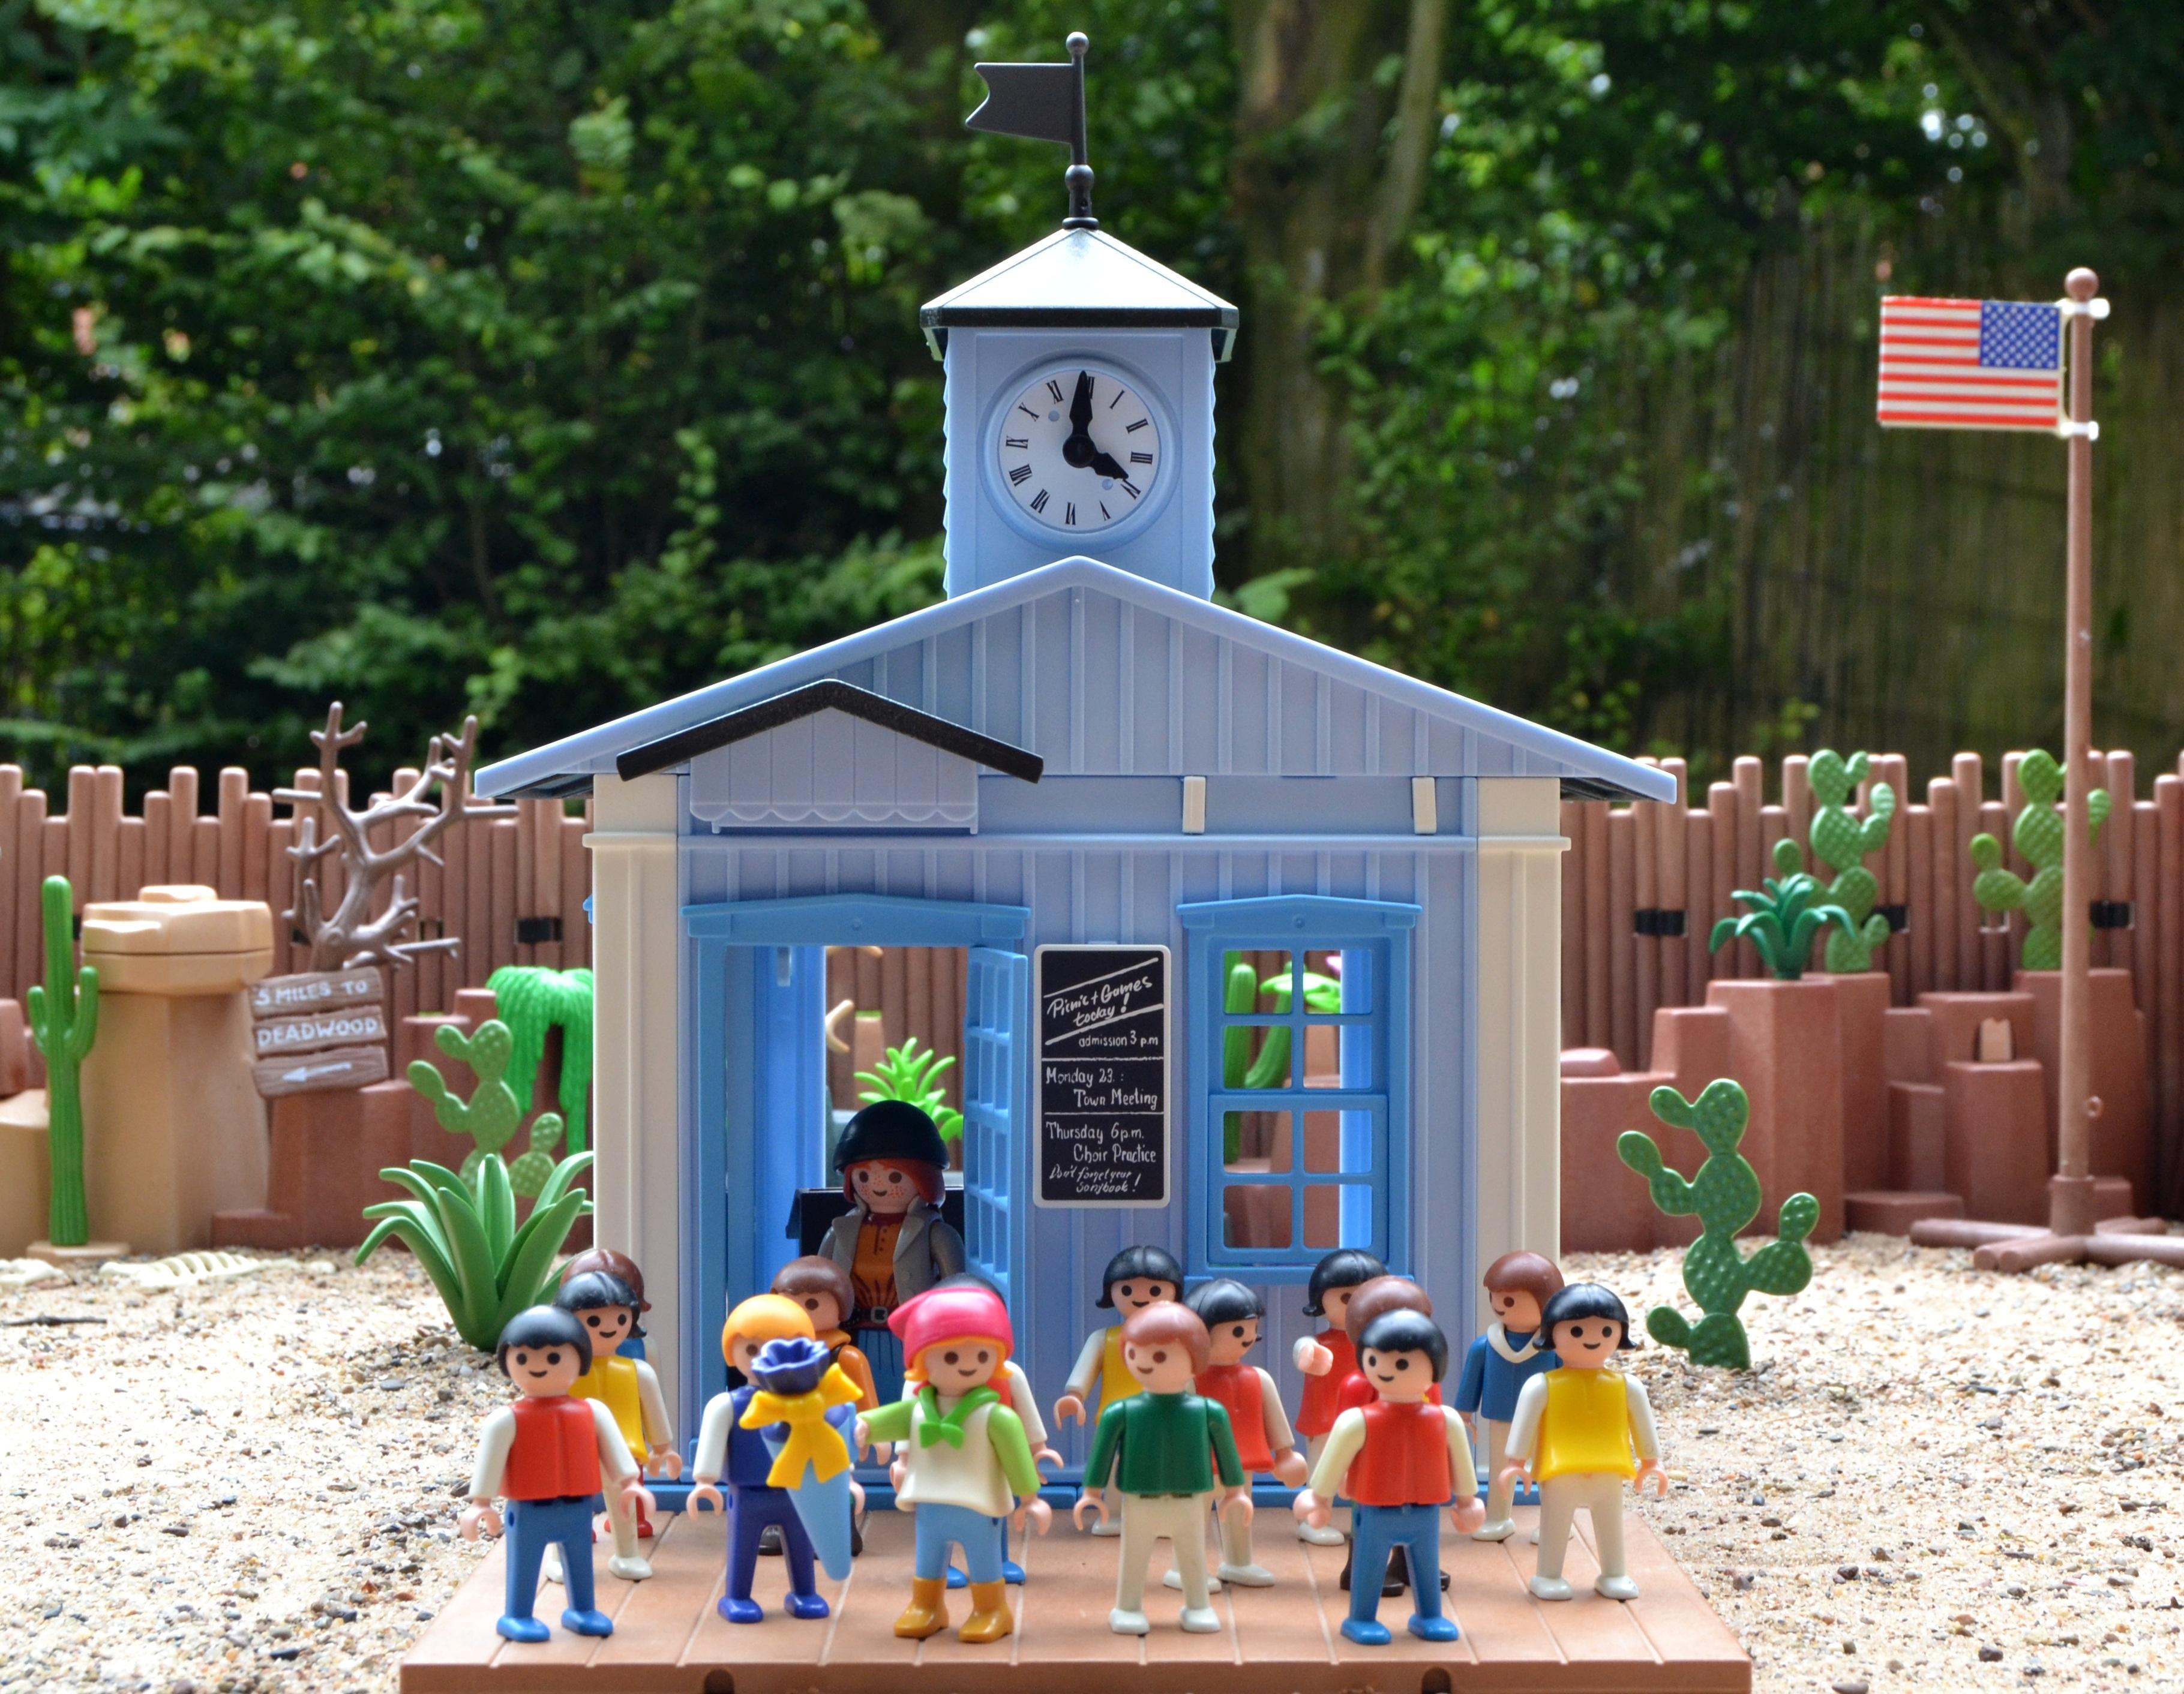 Backyard Toys free images : cactus, usa, america, training, backyard, toy